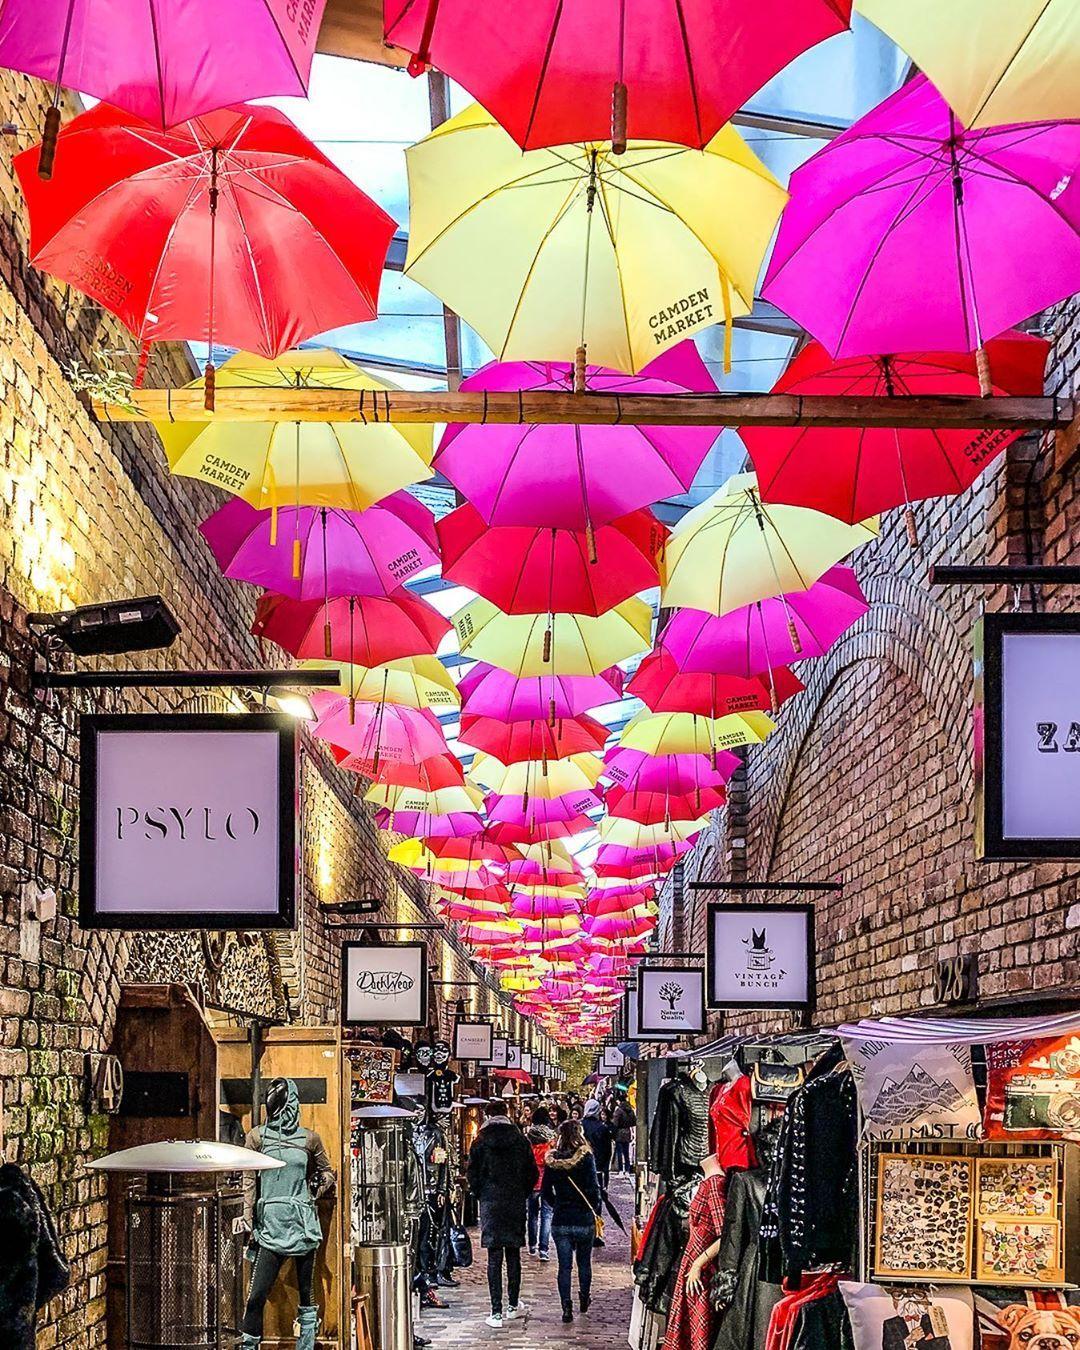 A Lady In London On Instagram This Umbrella Alley In Camden Market In London Is Great London Marke In 2020 Travel Guide London London Travel Best Markets In London